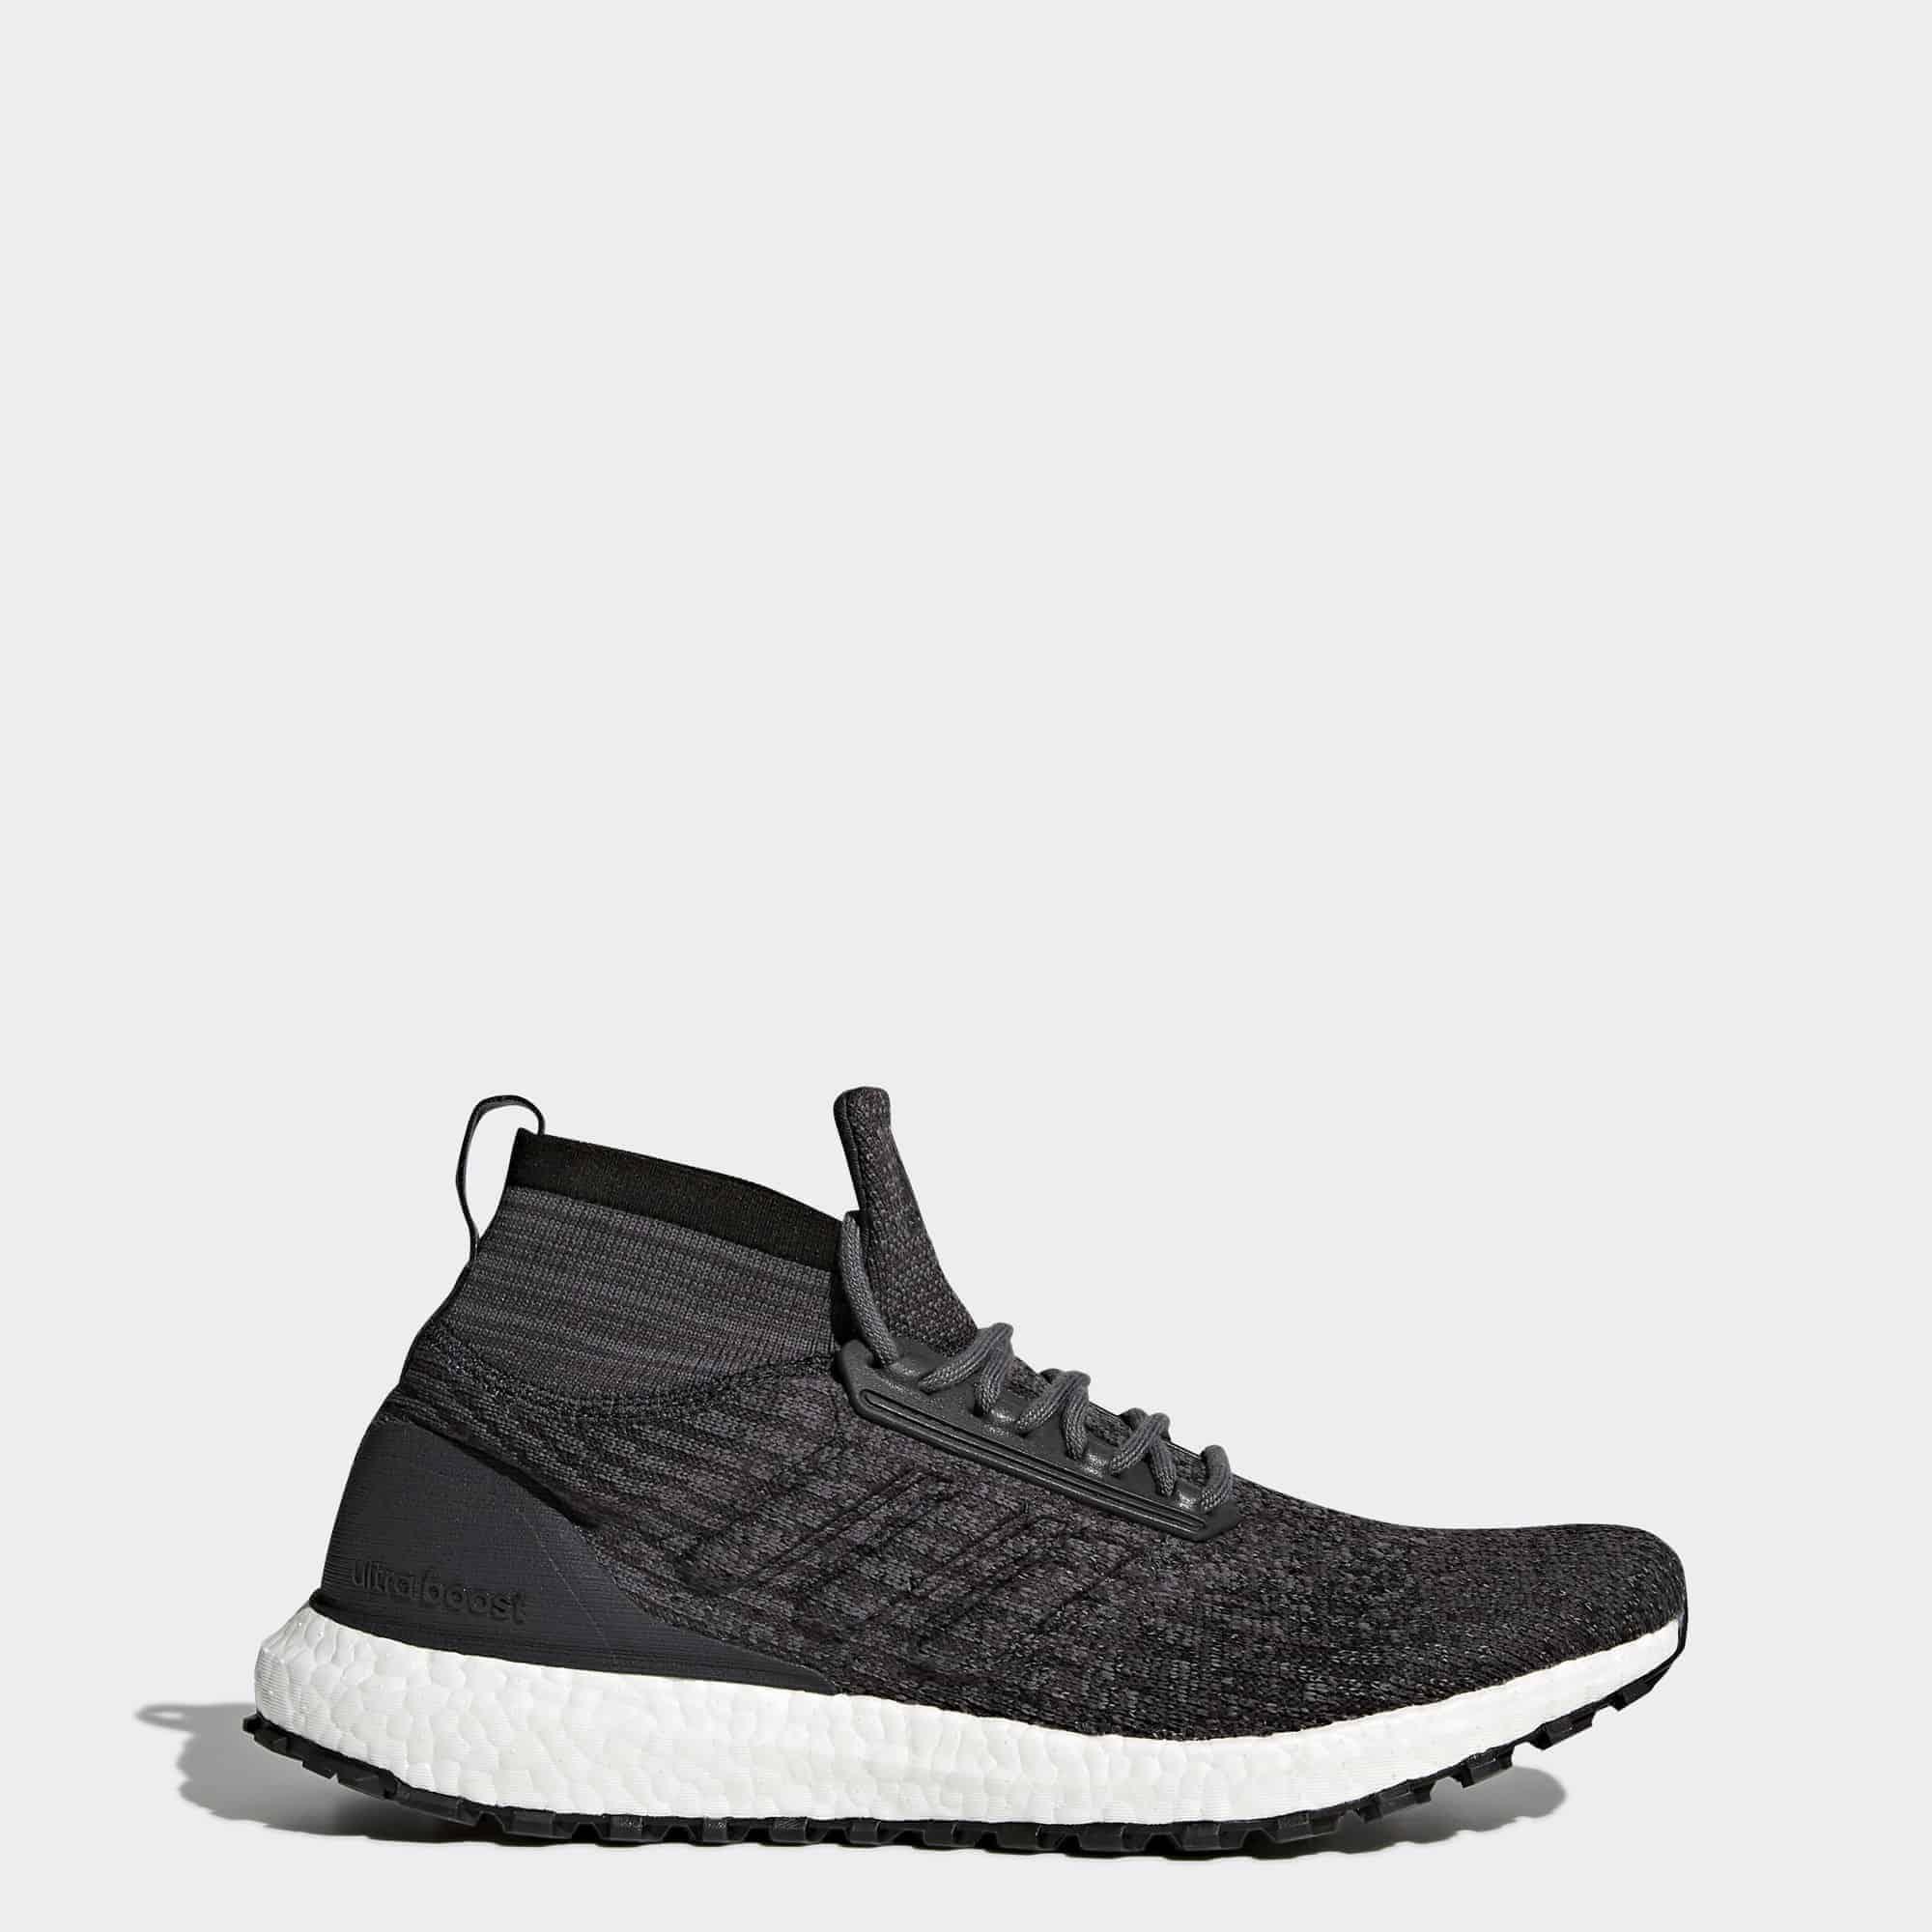 Кроссовки для бега Adidas Ultraboost All Terrain LTD мужские